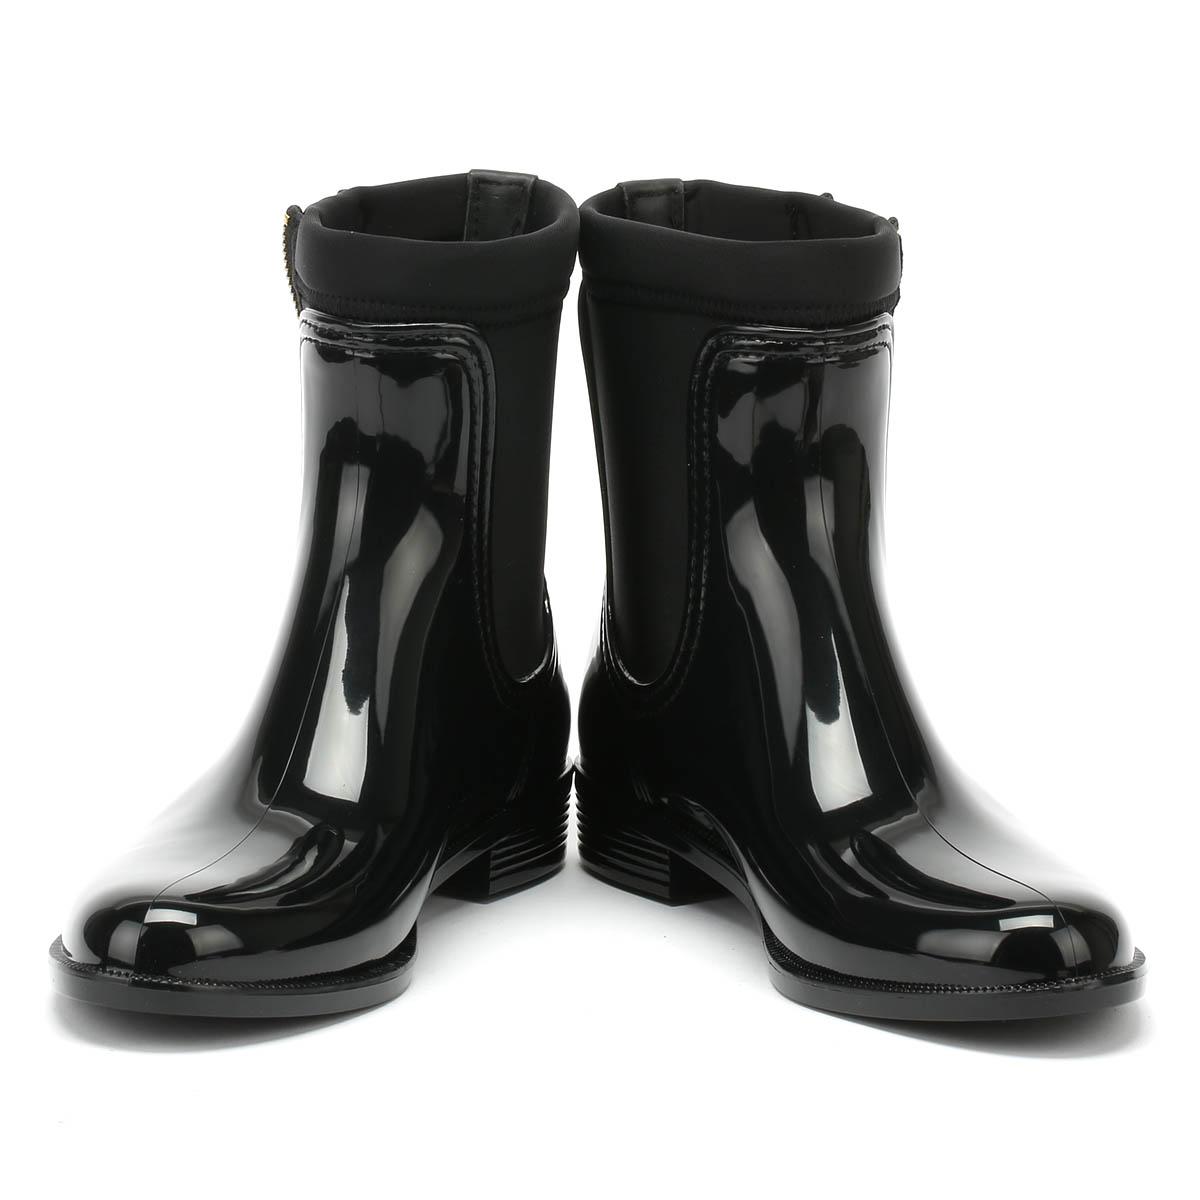 Tommy Hilfiger Womens Rain Boots Black Material Mix Zipped Casual ... c5cd7b2e65